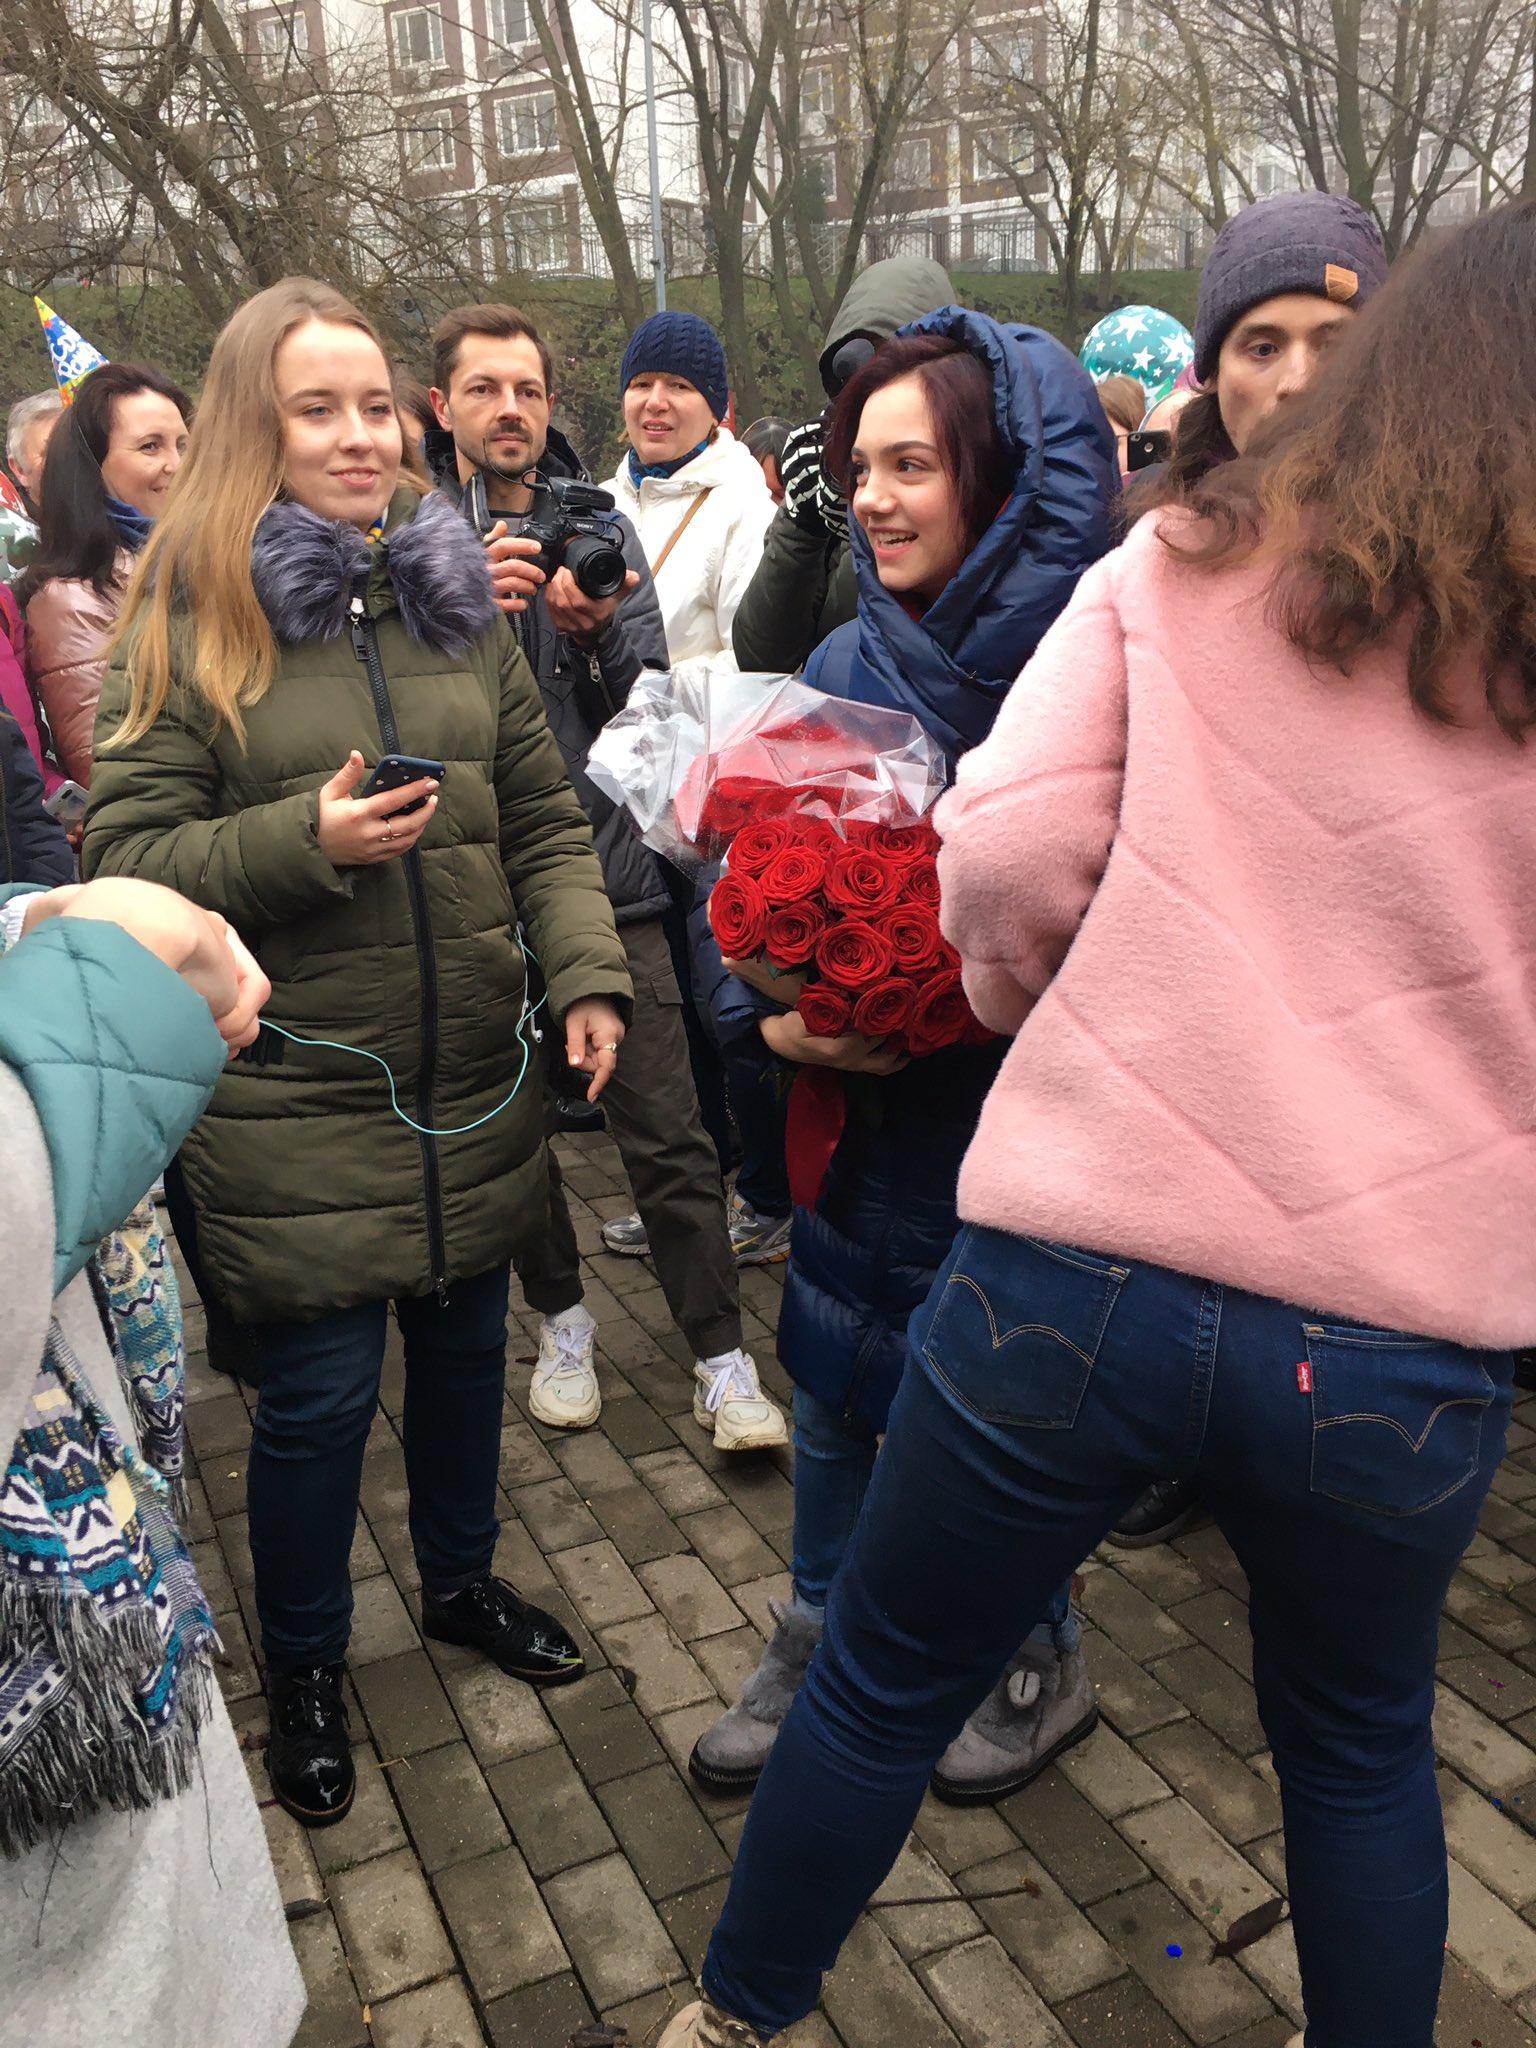 Evgenia Medvedeva | Медведева Евгения Армановна-6 - Страница 9 EJuHKXxWoAMwYPN?format=jpg&name=4096x4096